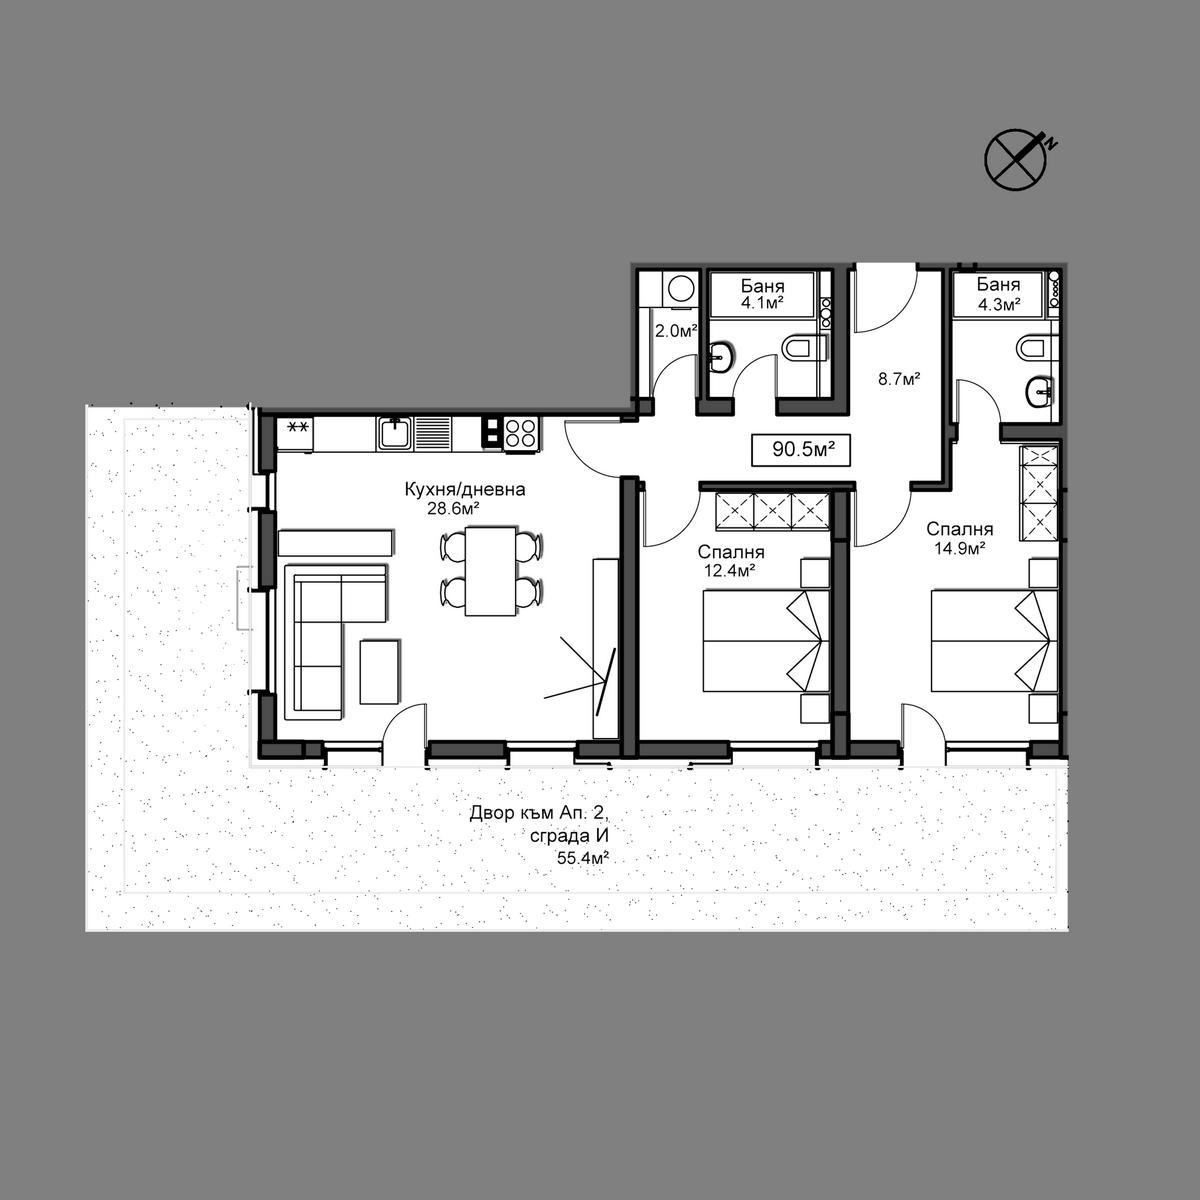 Продава апартамент ново строителство - Апартамент 2